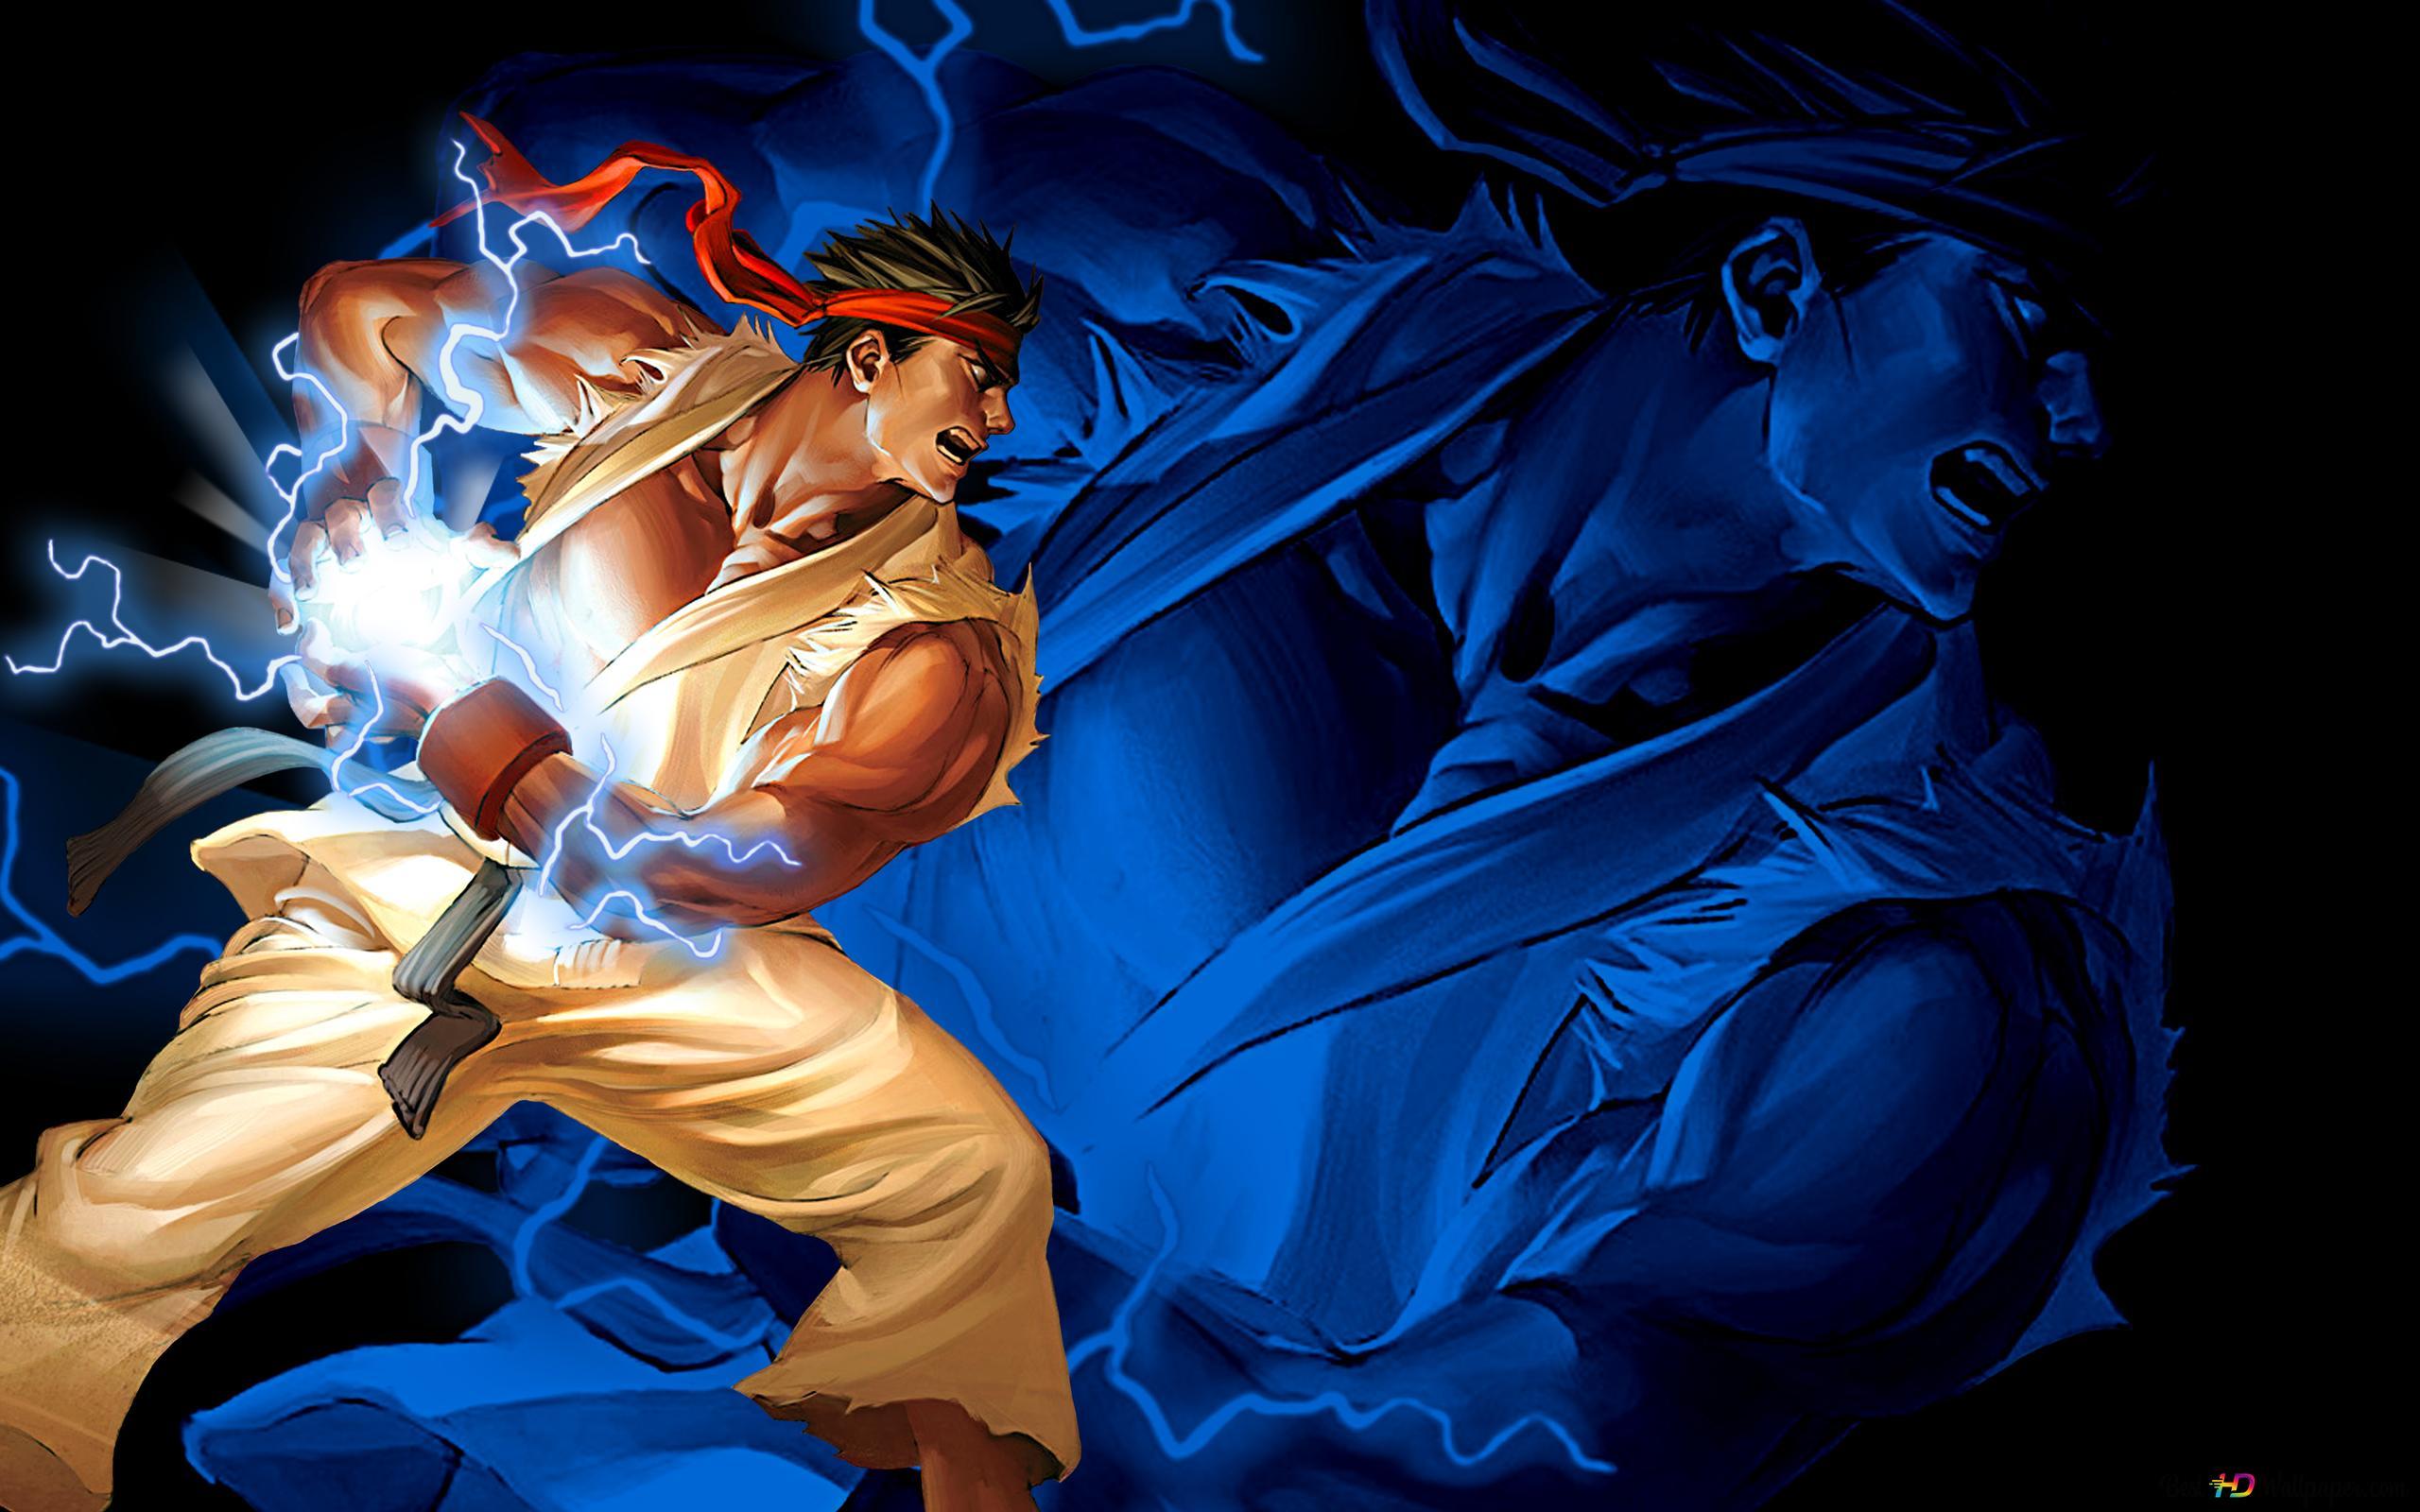 Street Fighter V Ryu Hadouken Hd Wallpaper Download